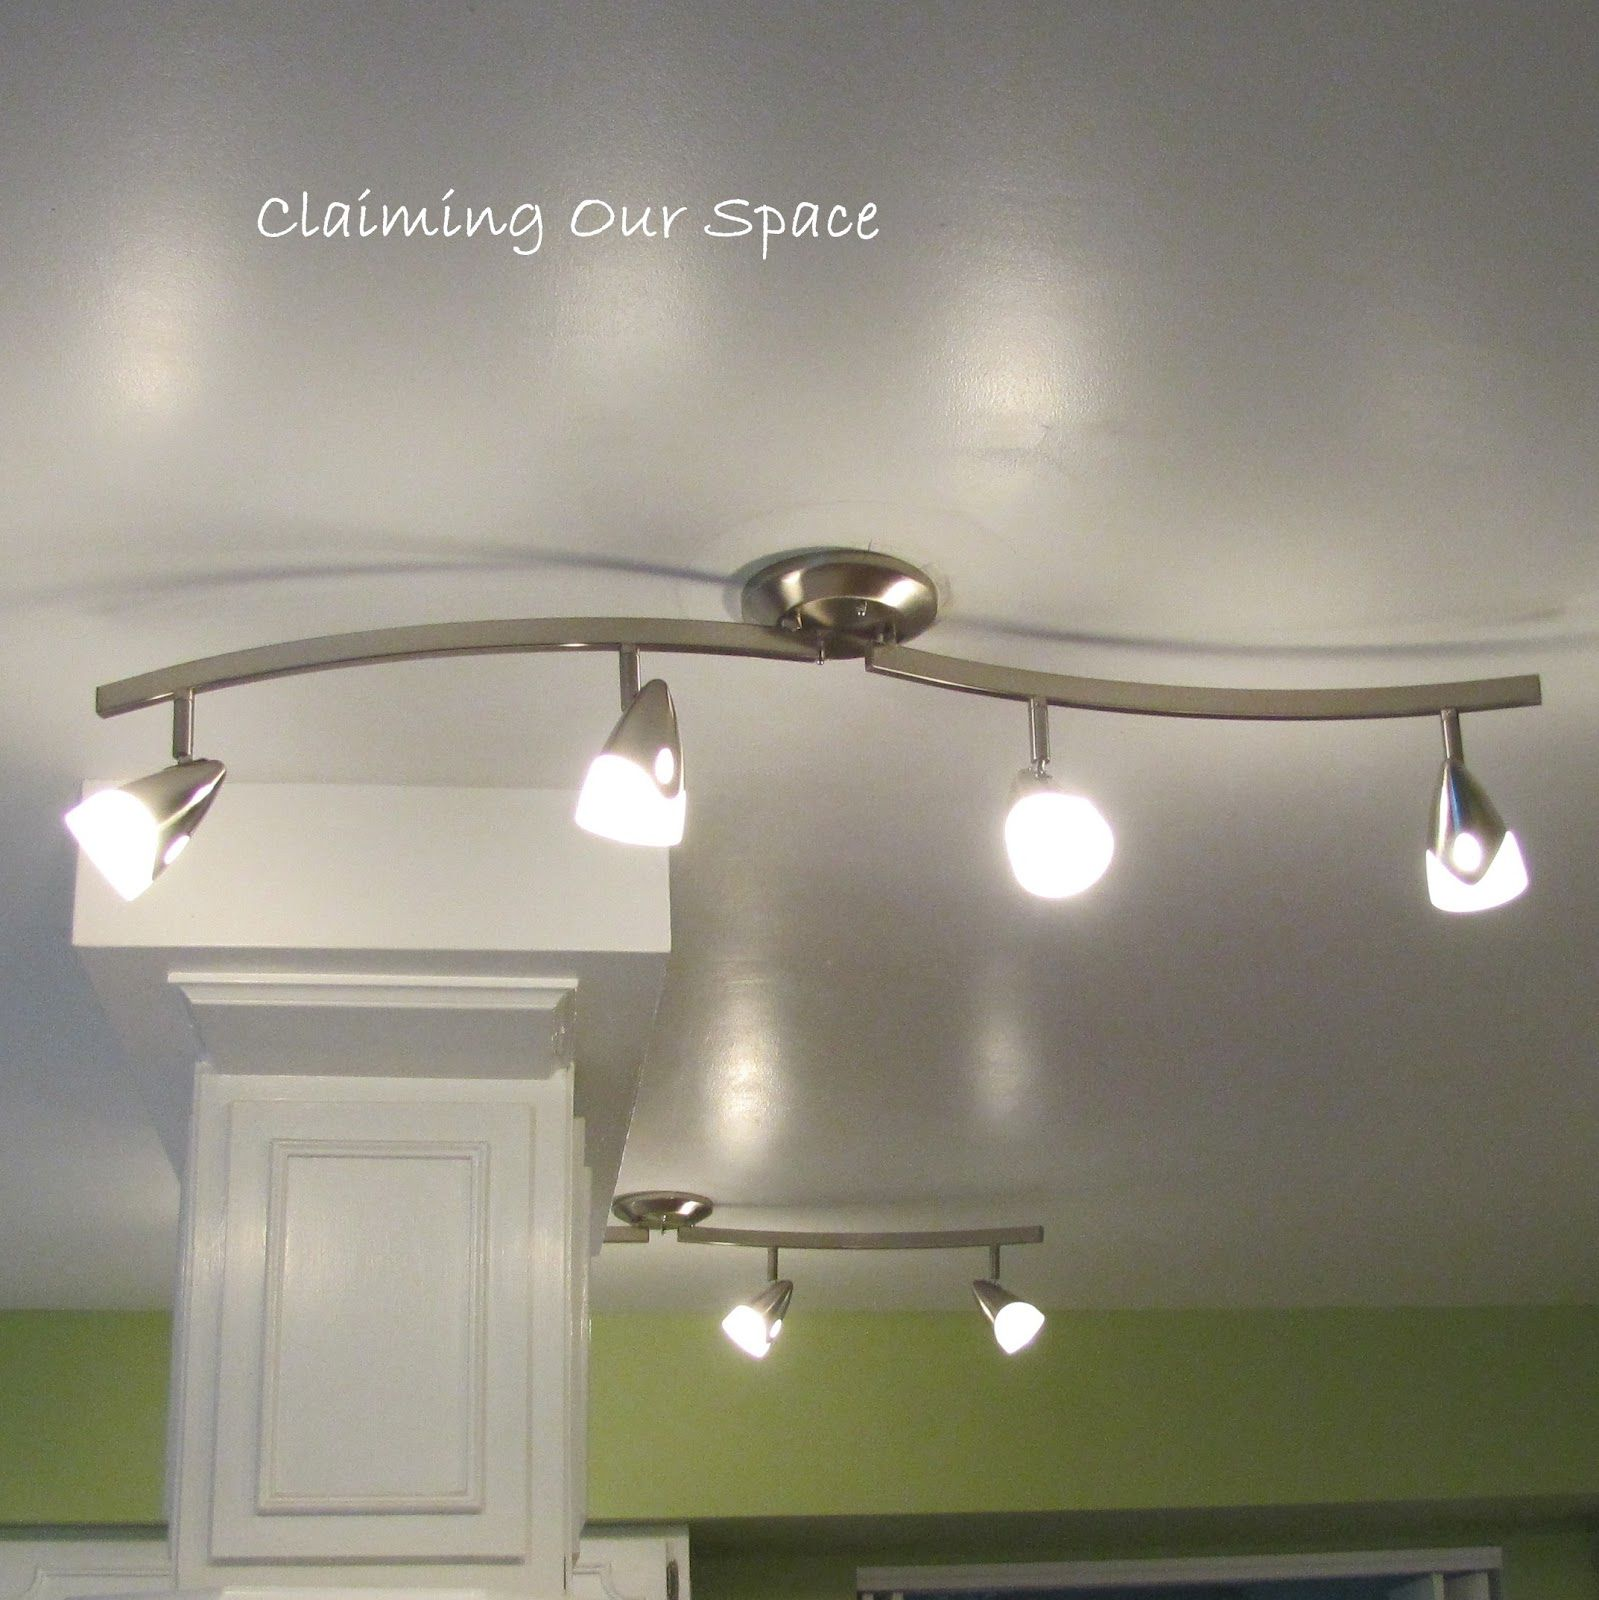 Ikea Kitchen Ceiling Lights Best Interior Paint Brands Check